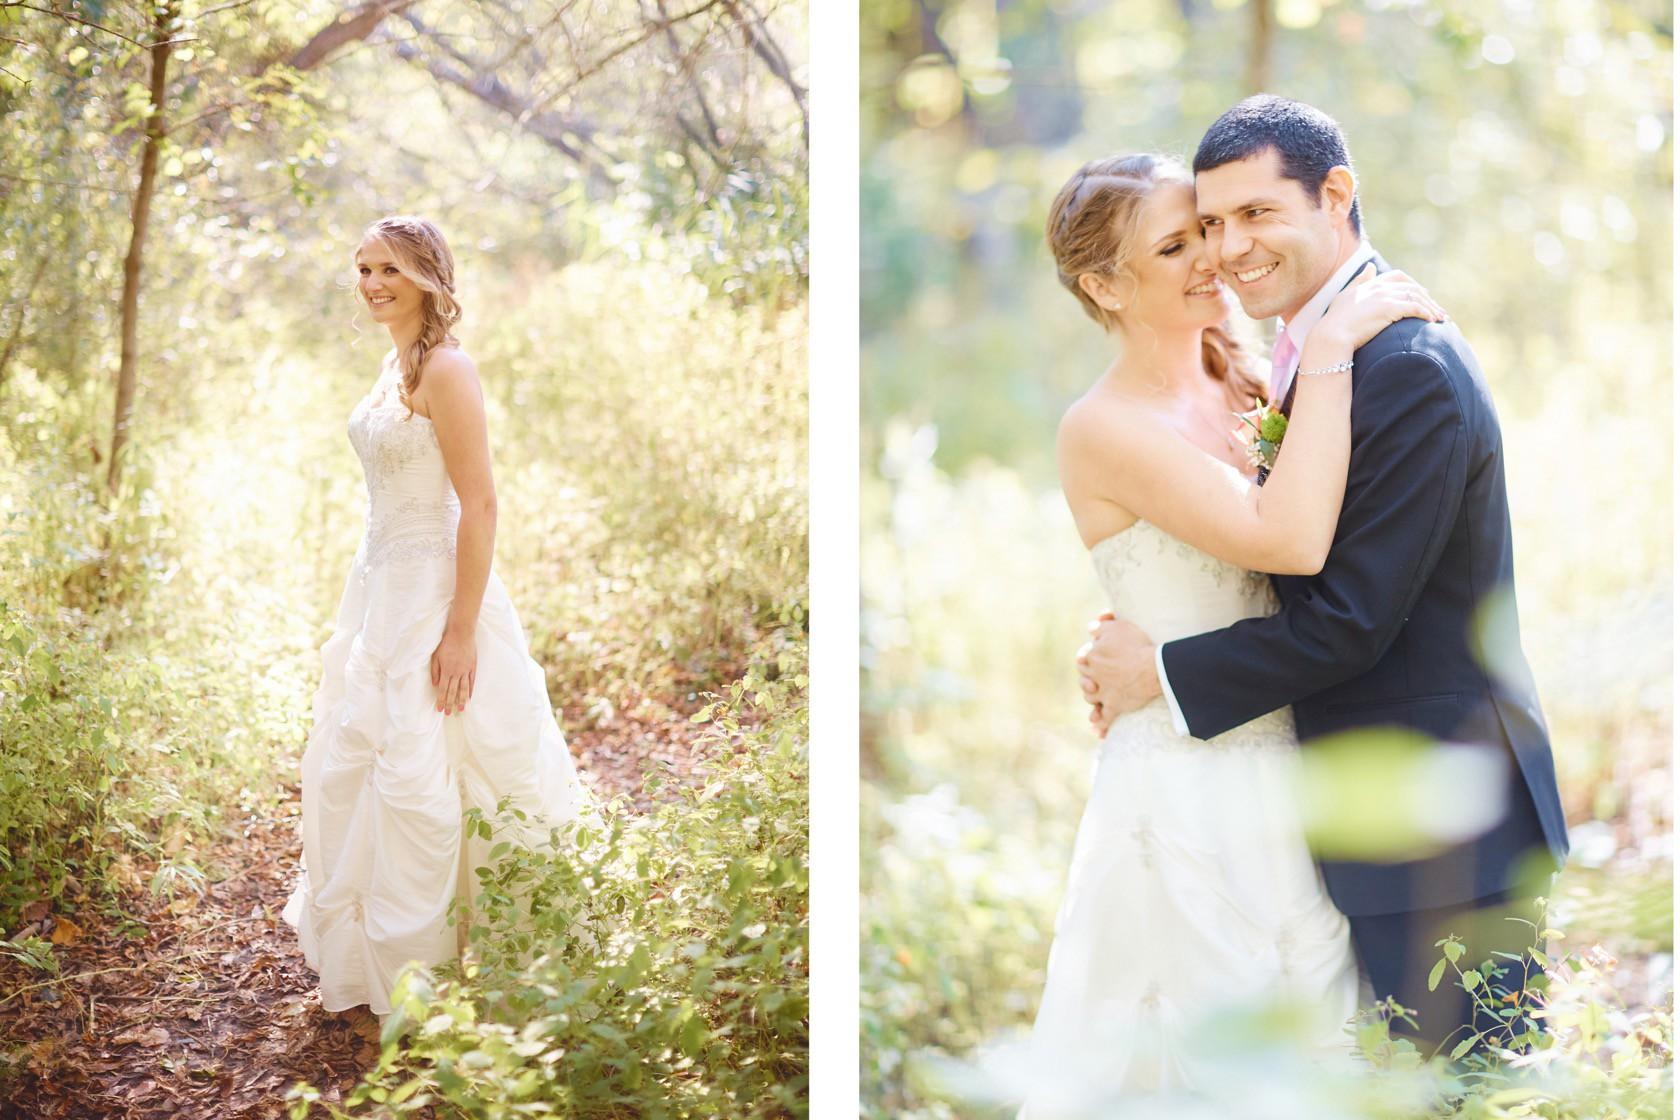 stephen sager photography 0114 fine art wedding photography